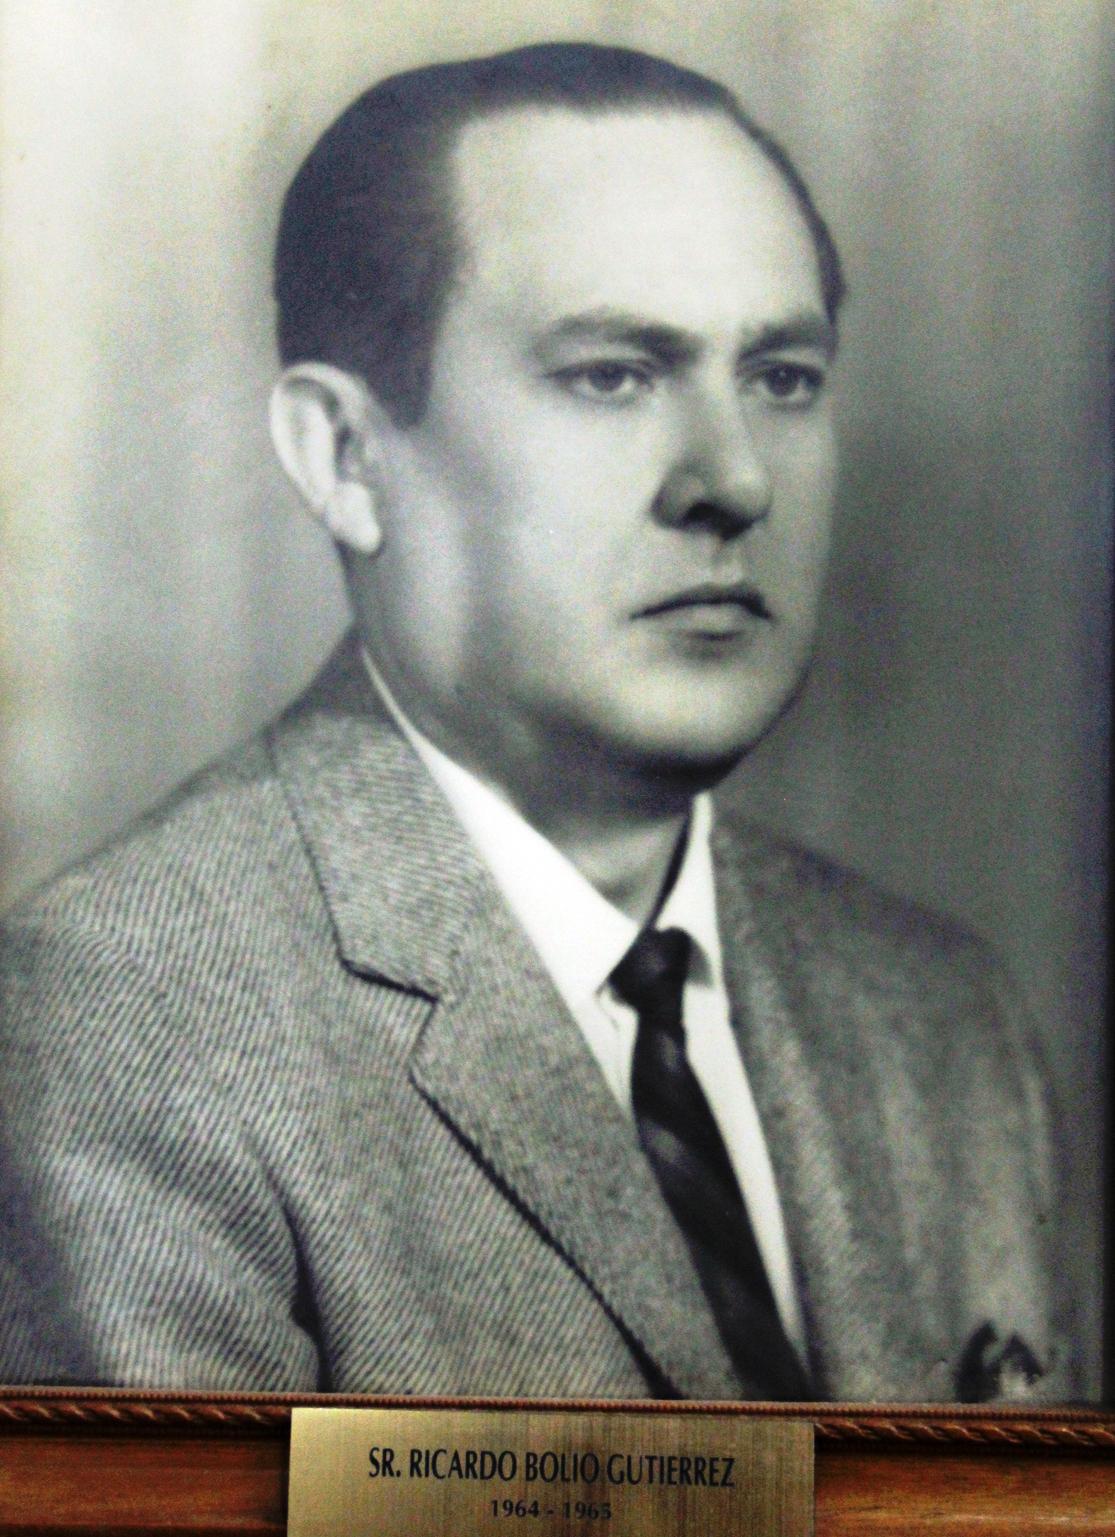 EMPRESARIO DISTINGUIDO SR. RICARDO BOLIO GUTIERREZ